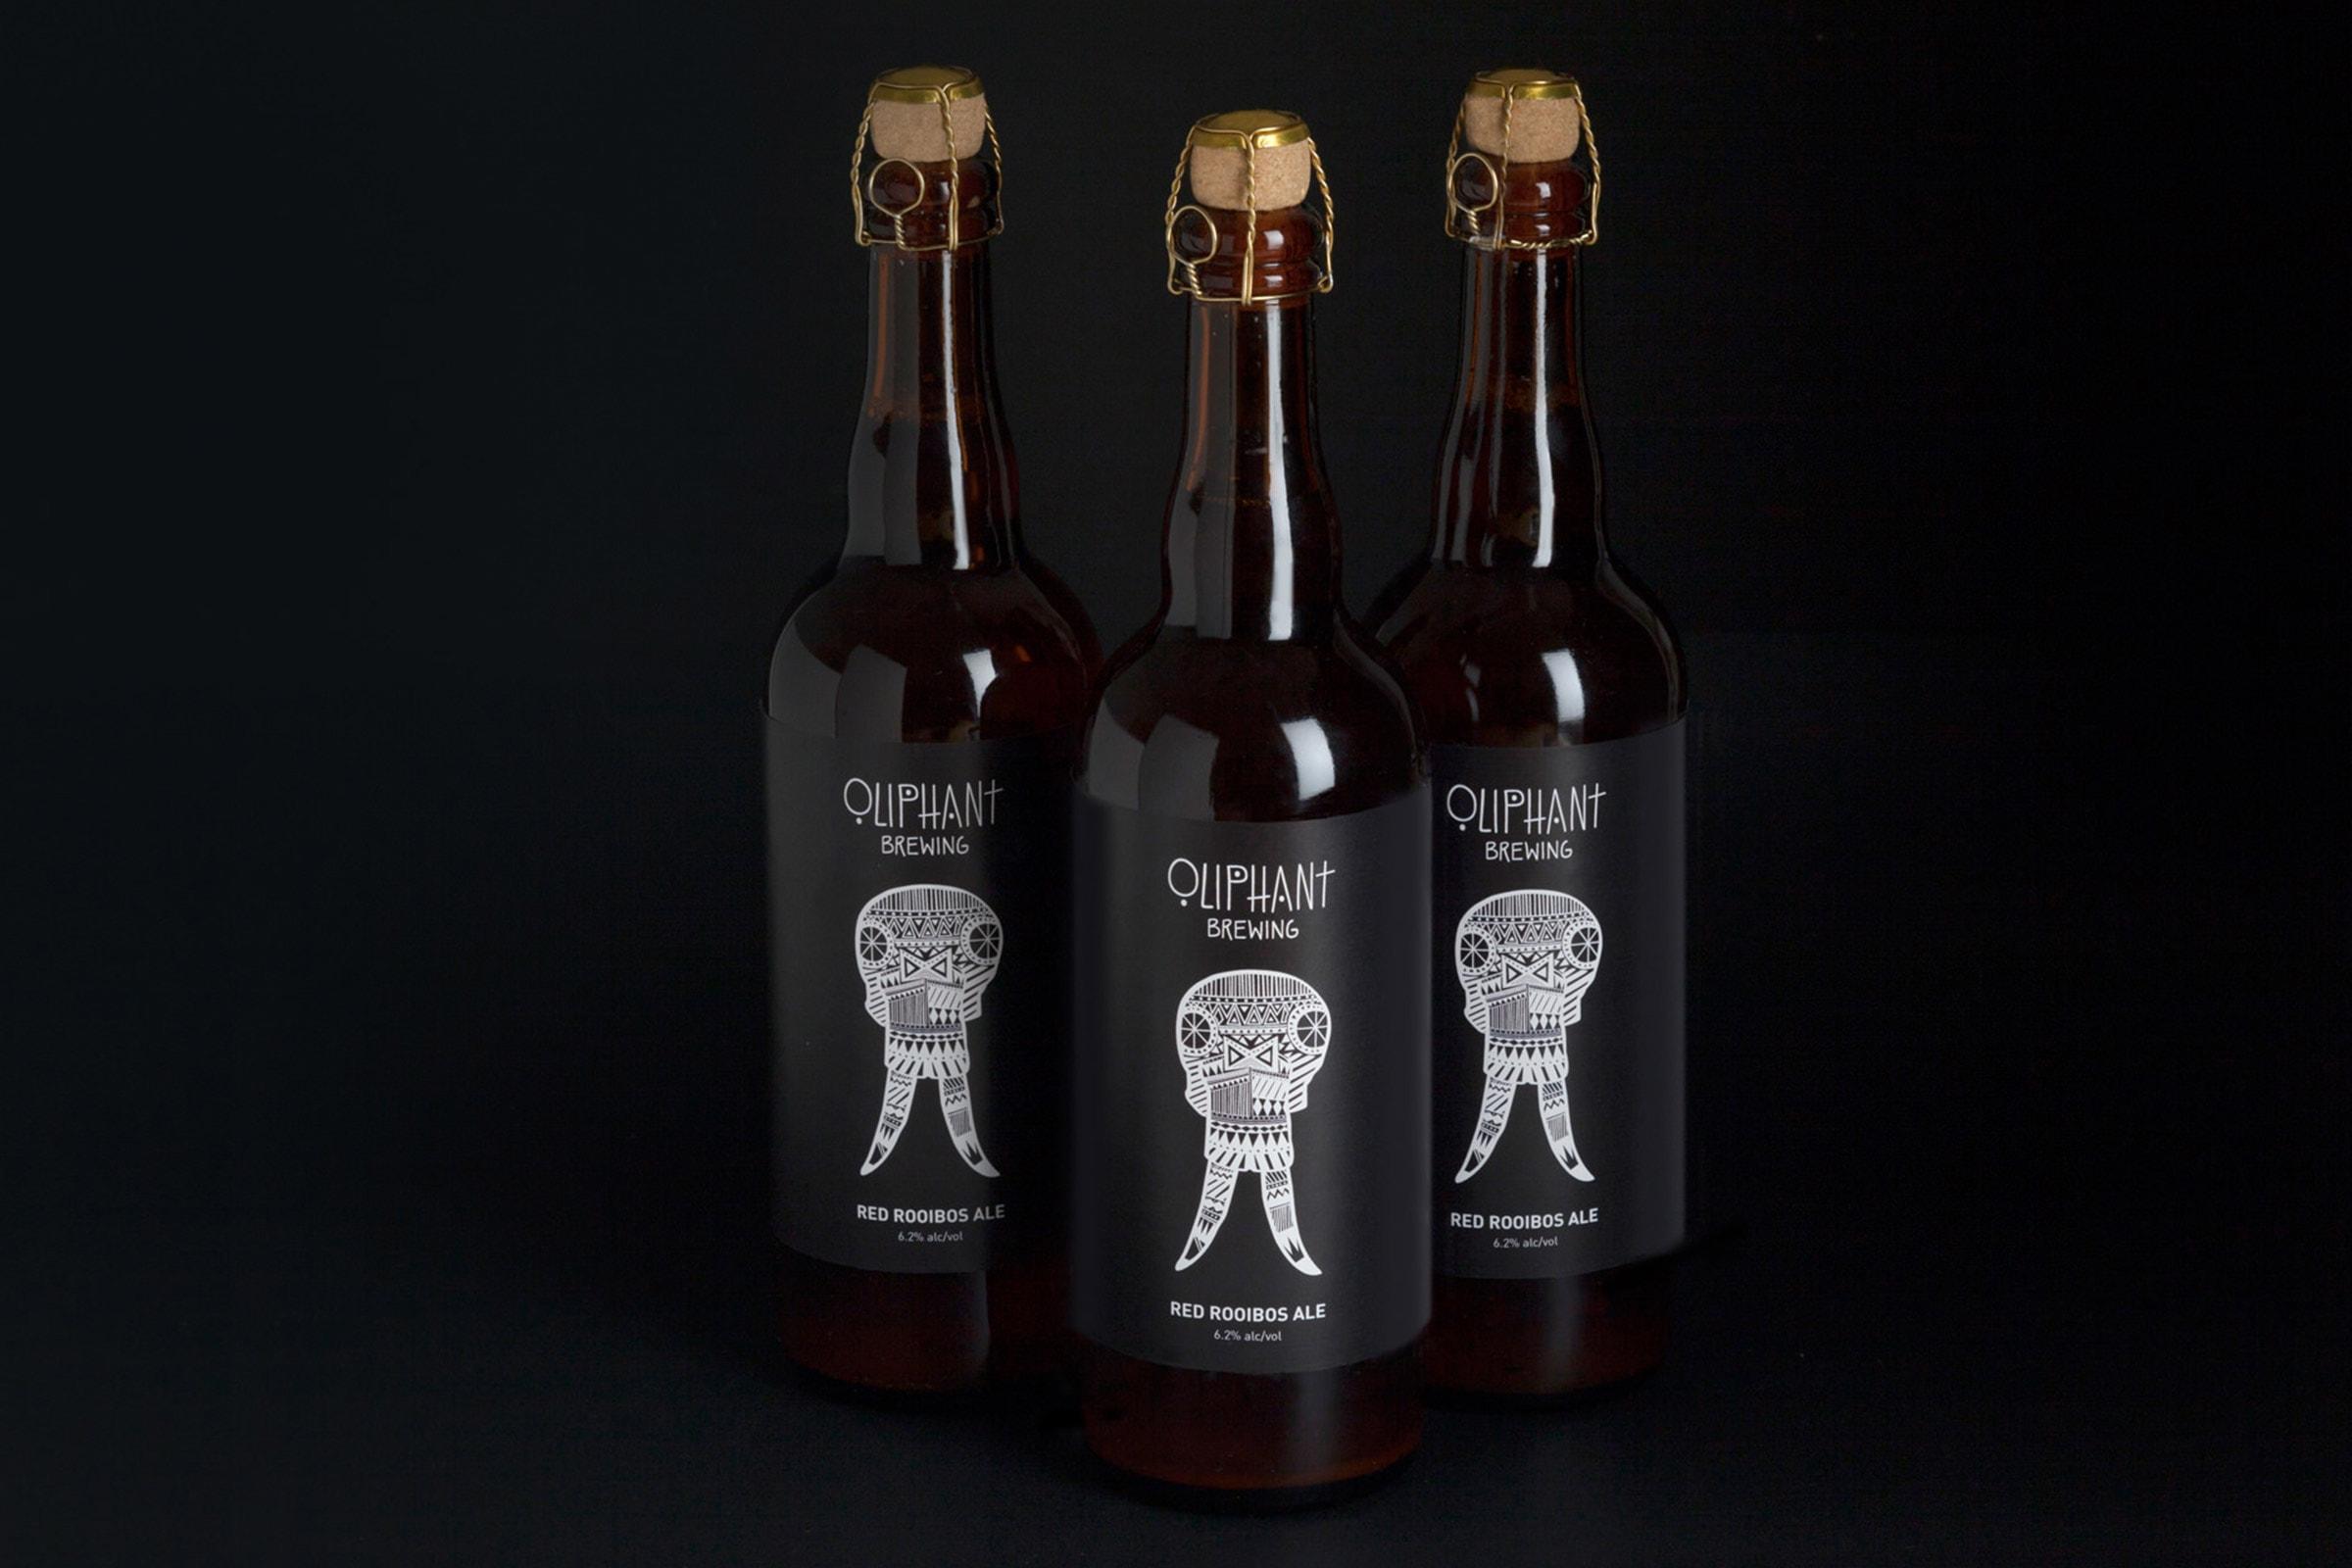 Packaging, Start Up, Artisanal Brewery, Craft Beer, New York Bier